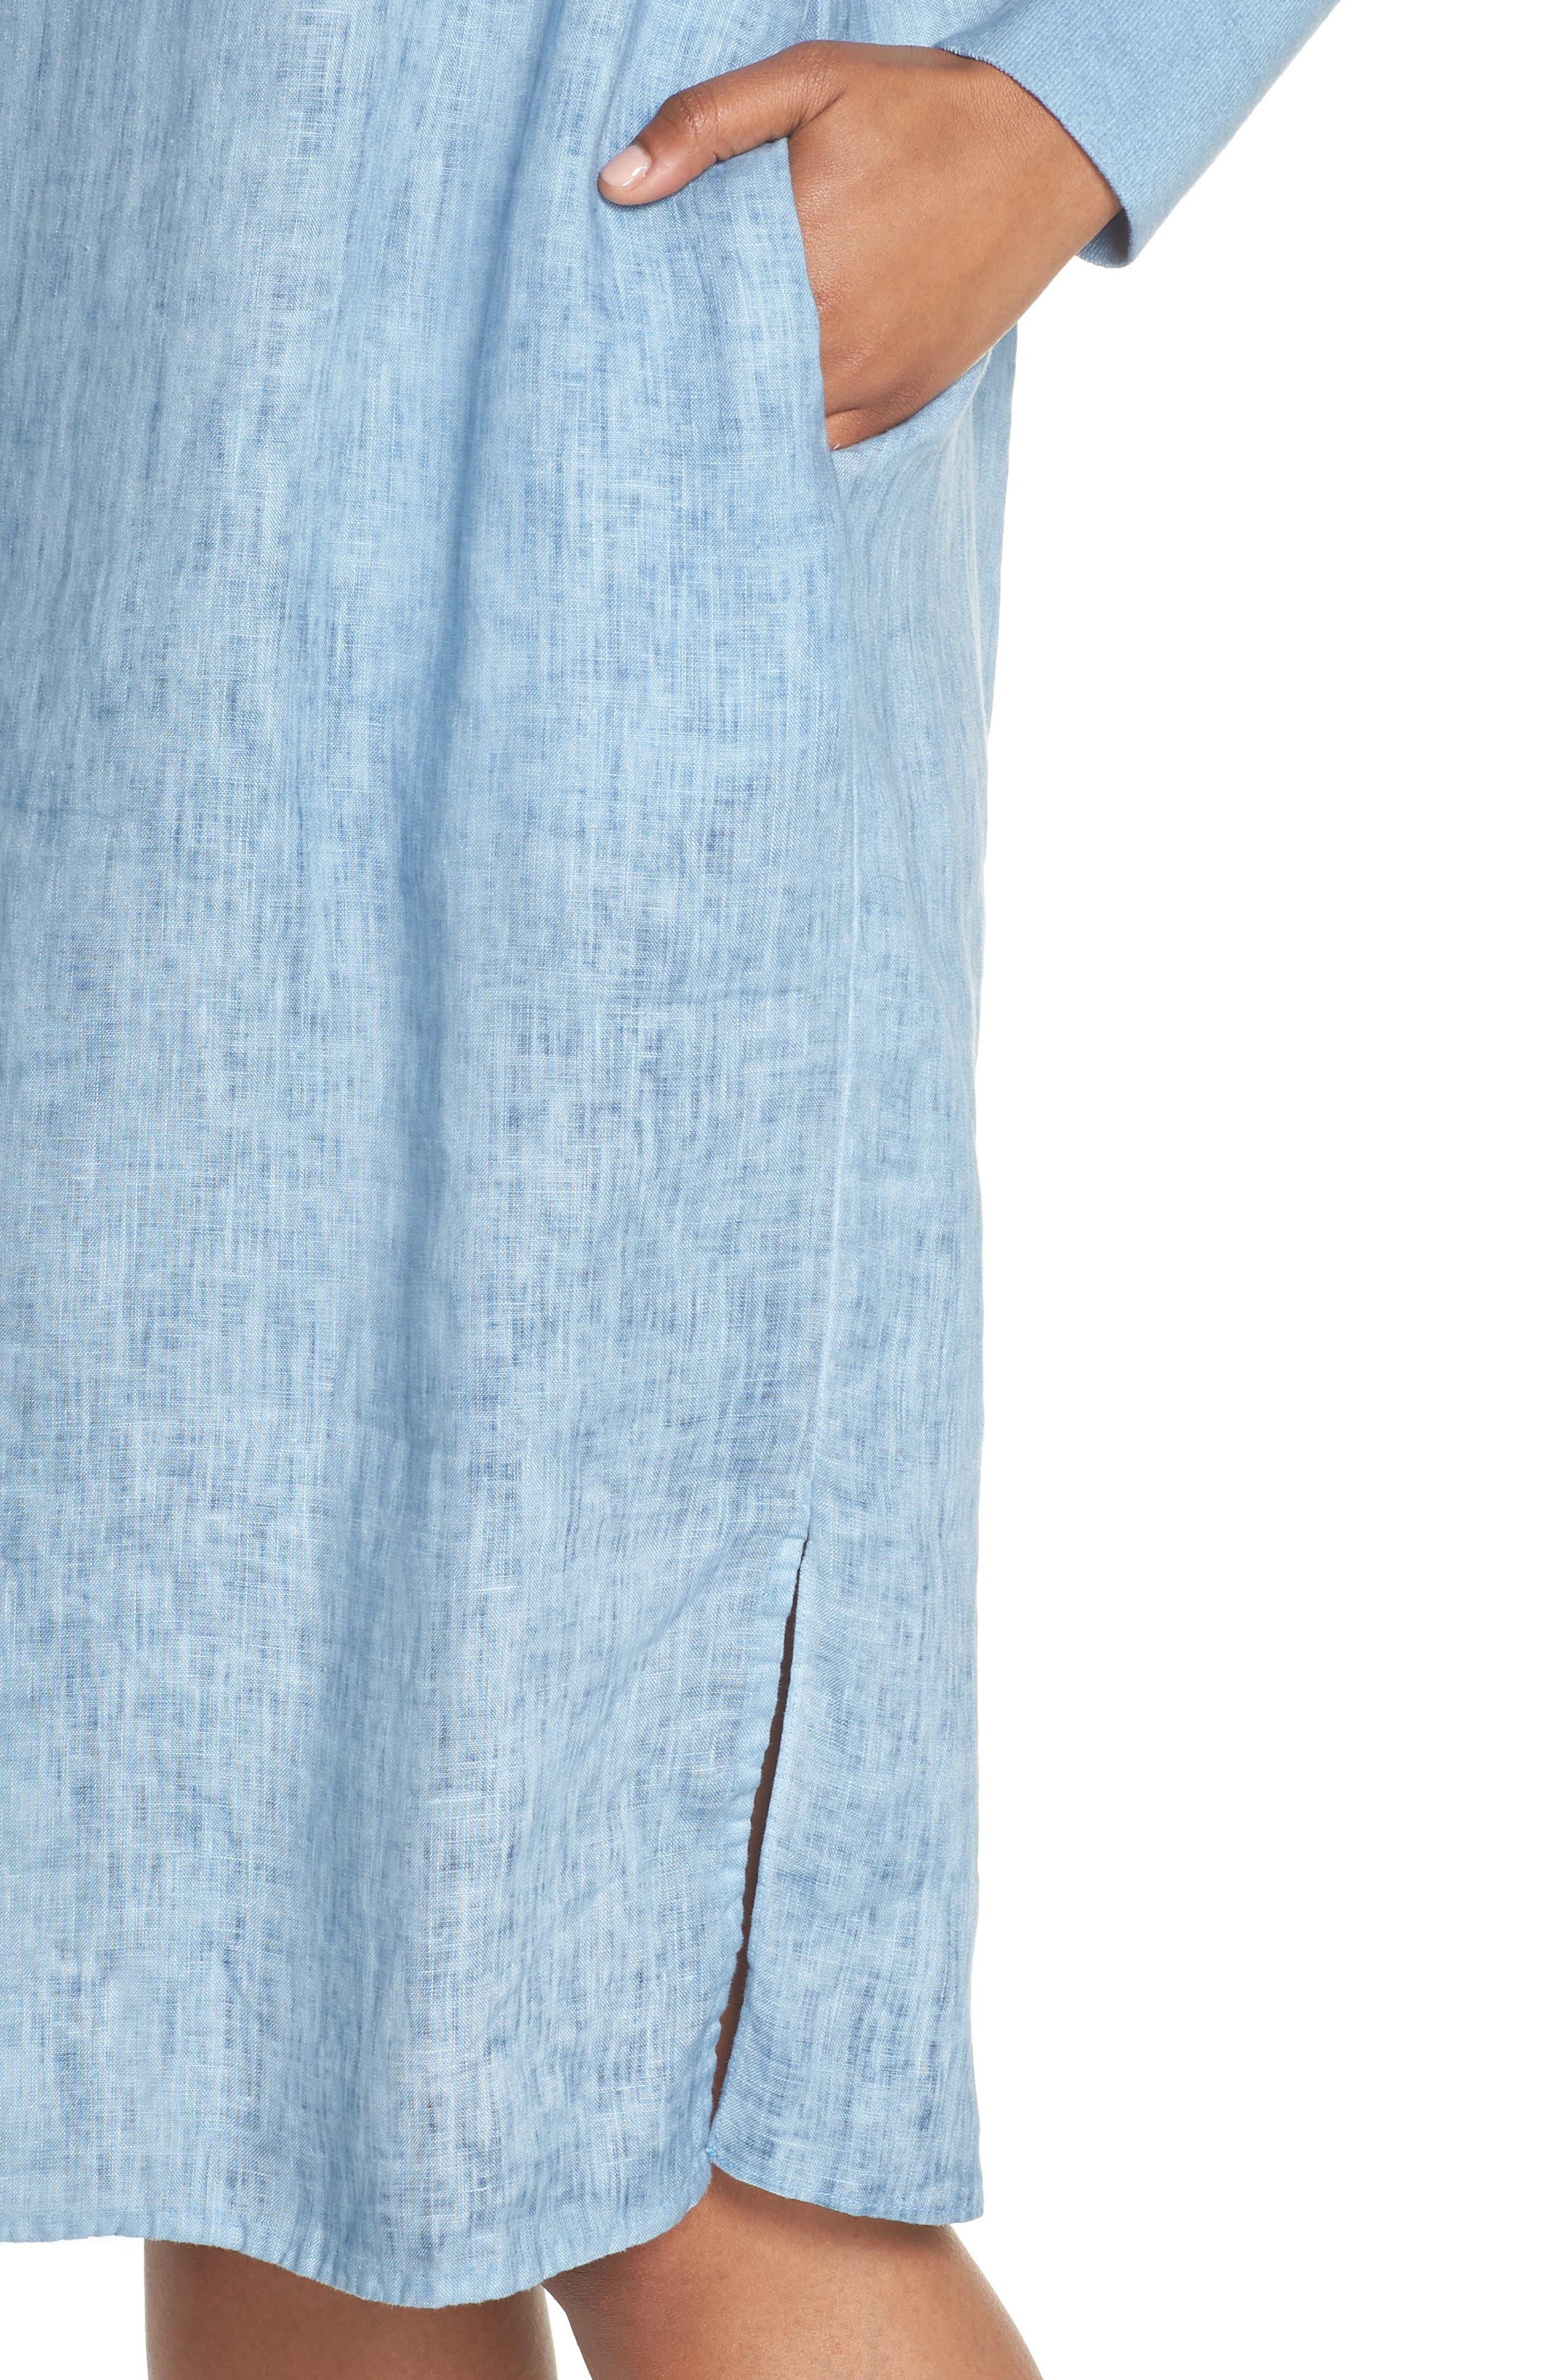 Rata Linen Shift Dress,                             Alternate thumbnail 4, color,                             Blue